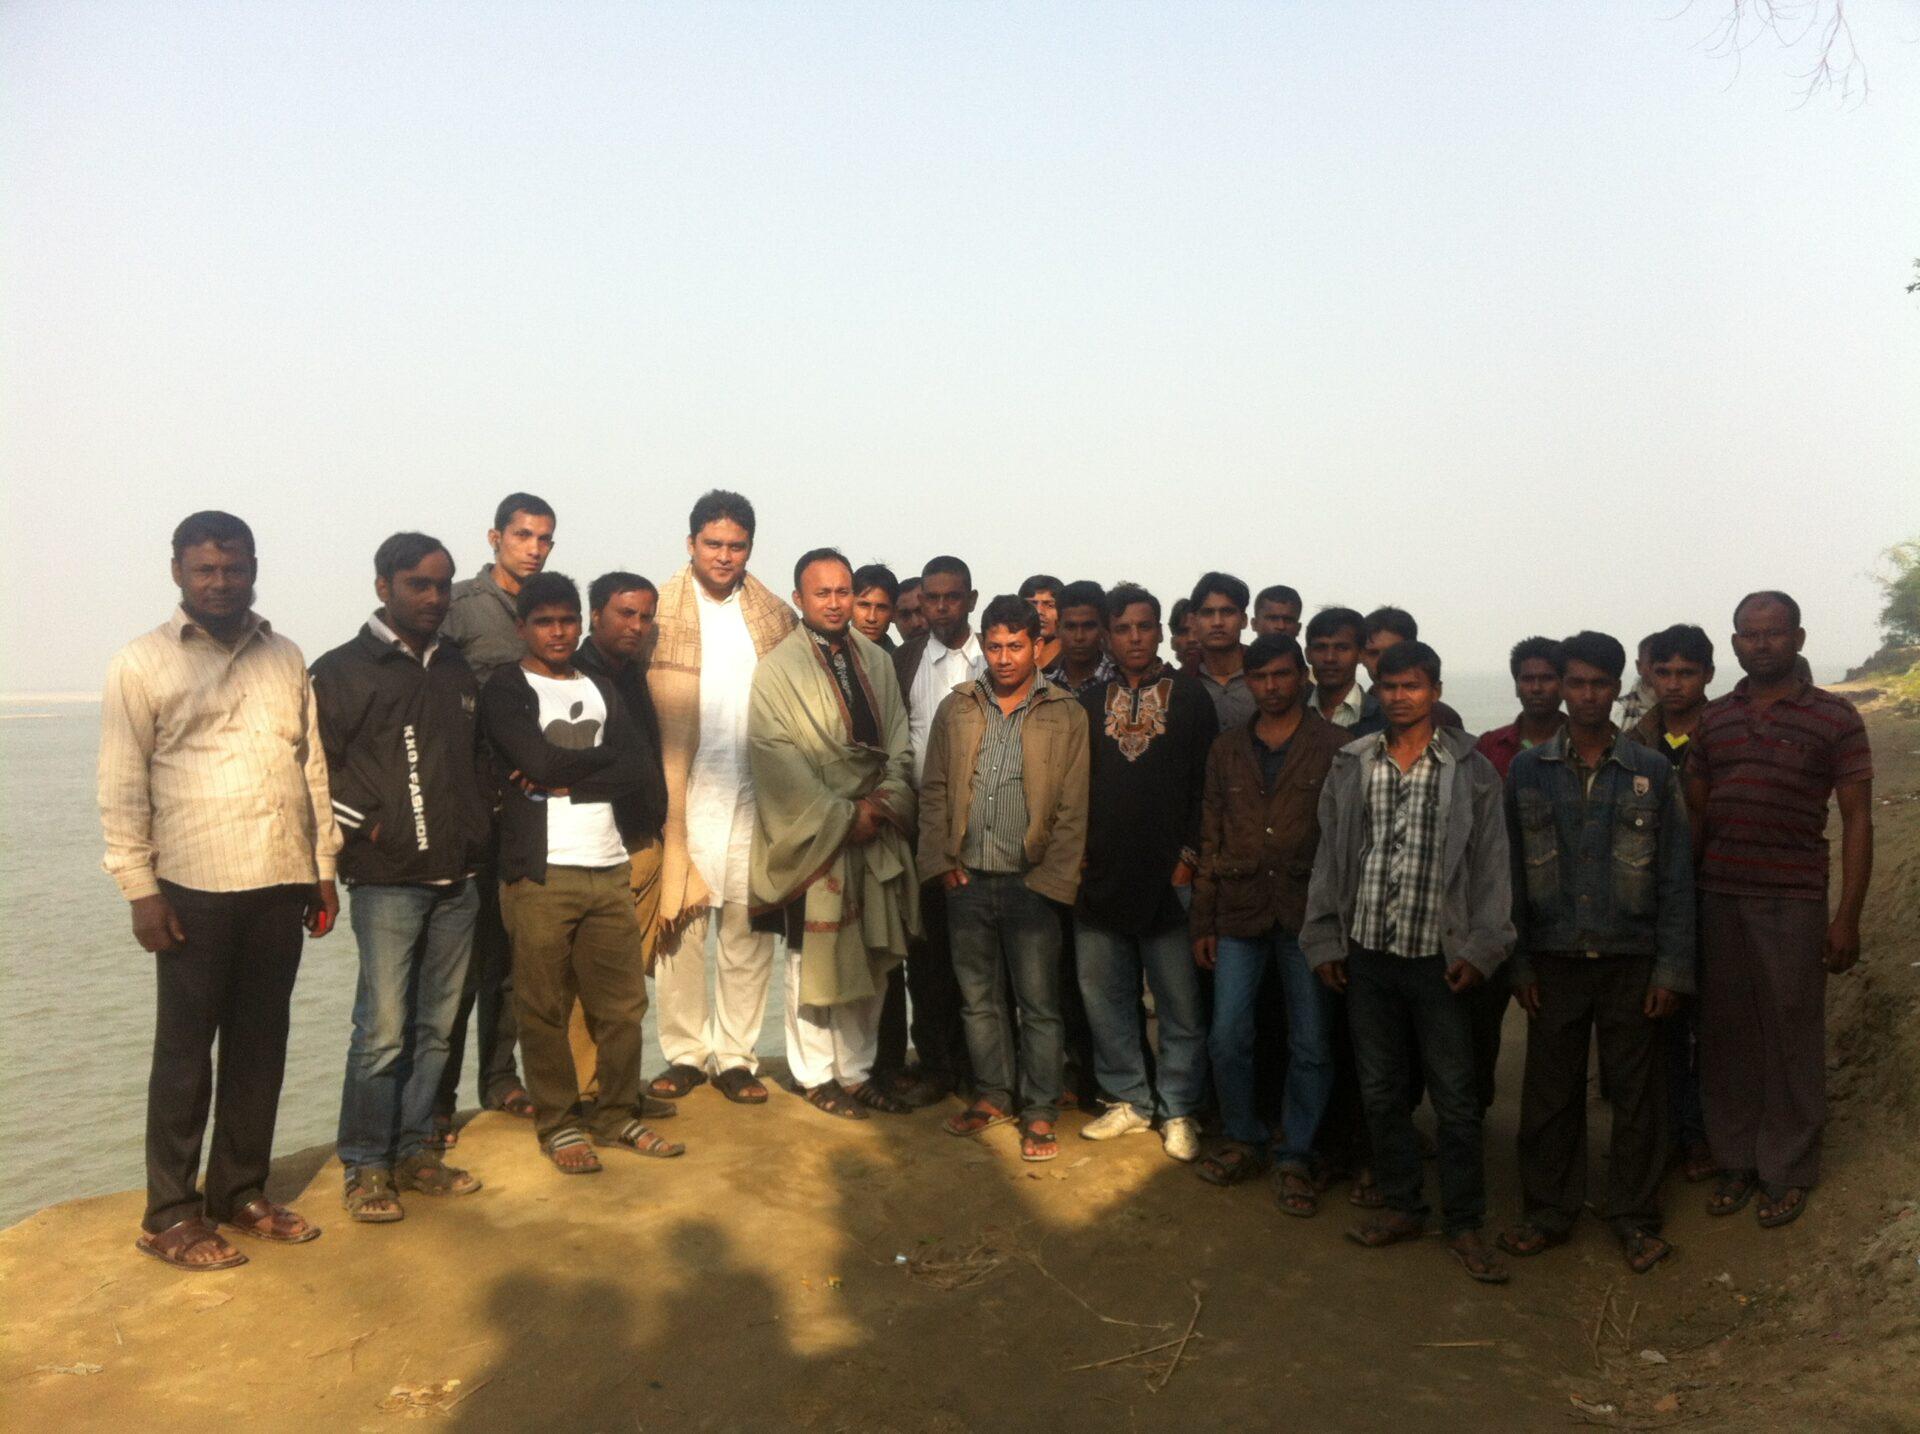 10th National Campaign- with Koya Union workers team | দশম জাতিয় সংসদ নির্বাচন - কয়া ইউনিয়নের, সুলতানপুর গ্রামের কর্মীদের সাথে